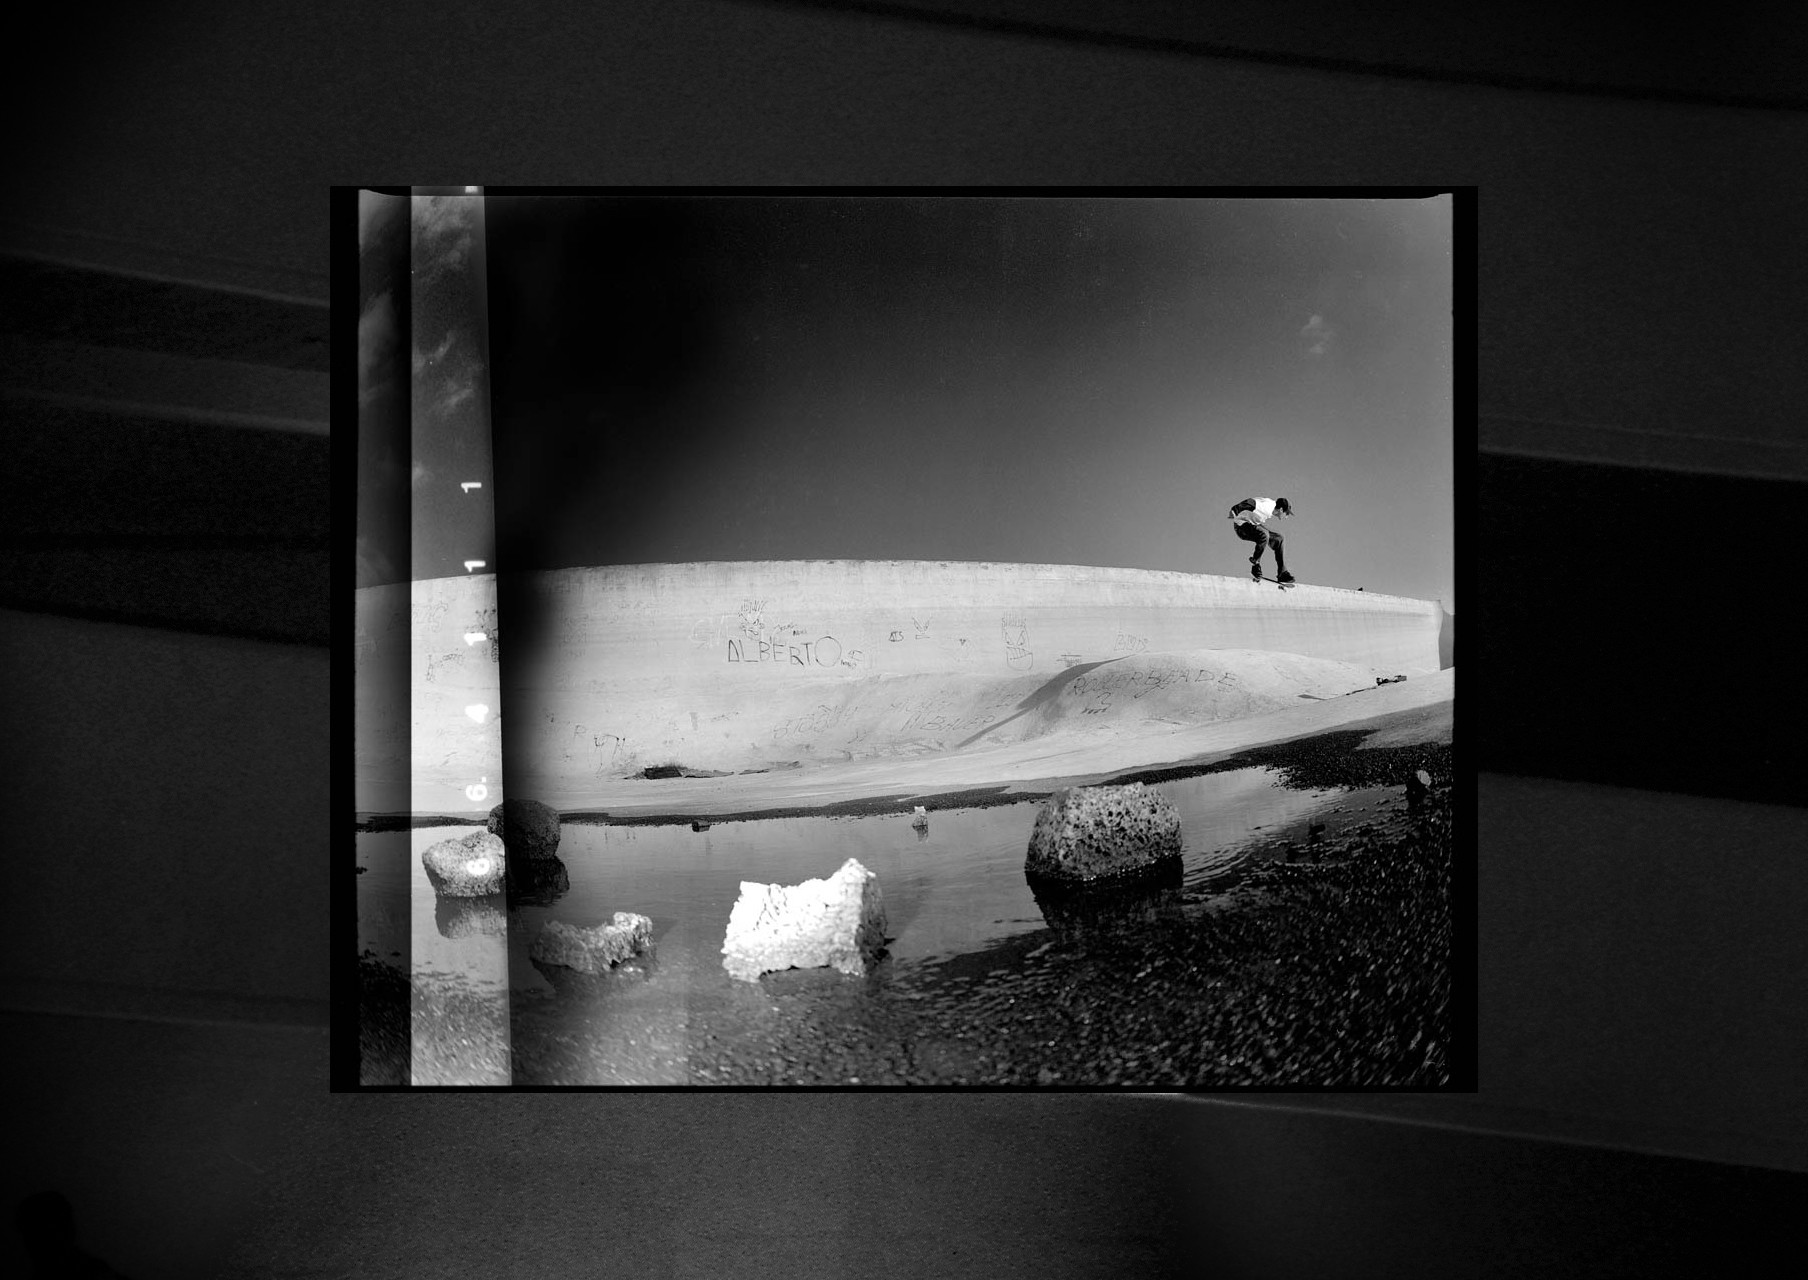 SKATE-STREET-PHOTOGRAPHY-15-JUANMI-MARQUEZ-1761x1280-1761x1280